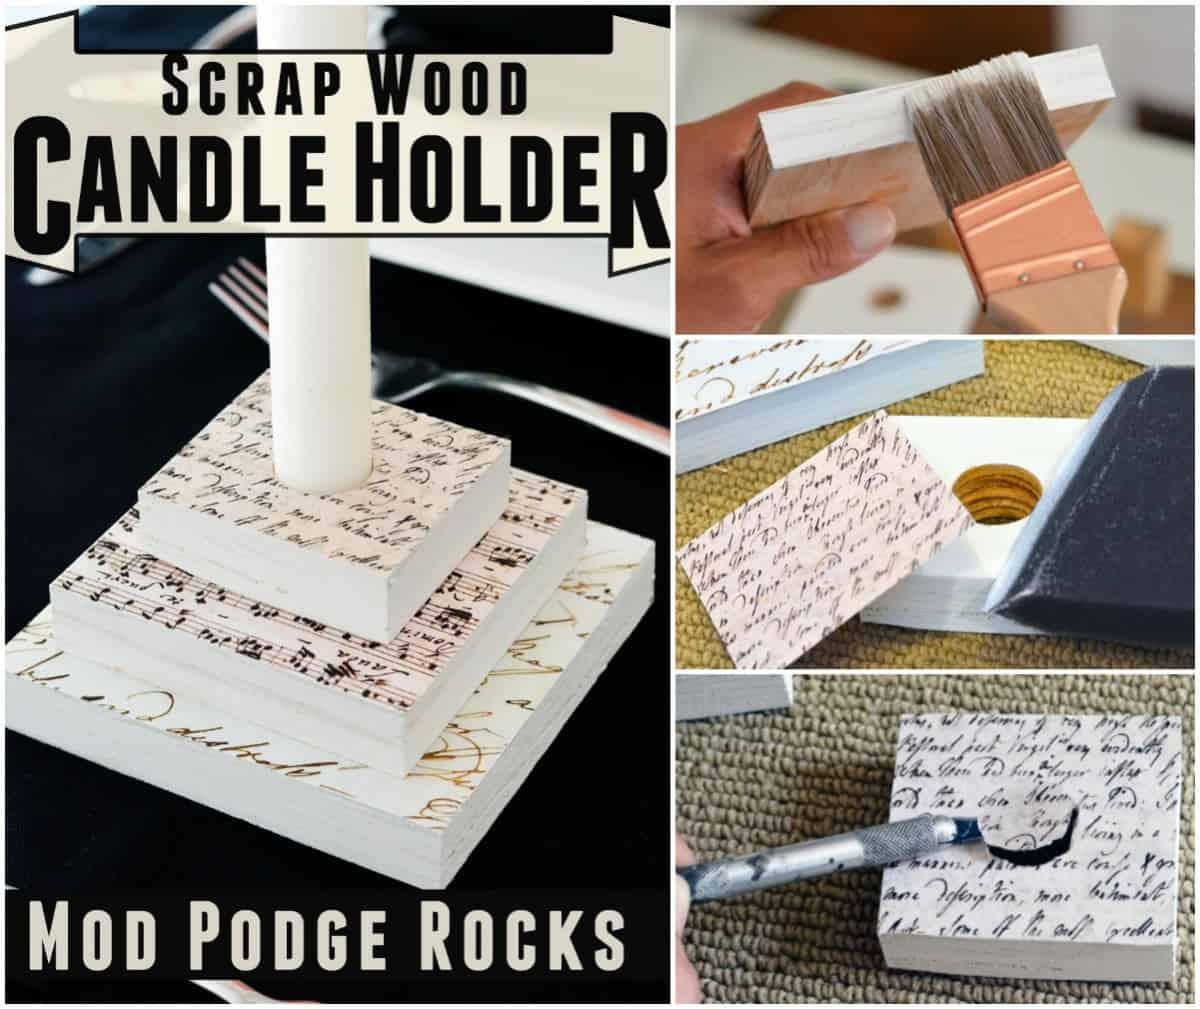 How To Make Scrap Wood Candle Holders Mod Podge Rocks